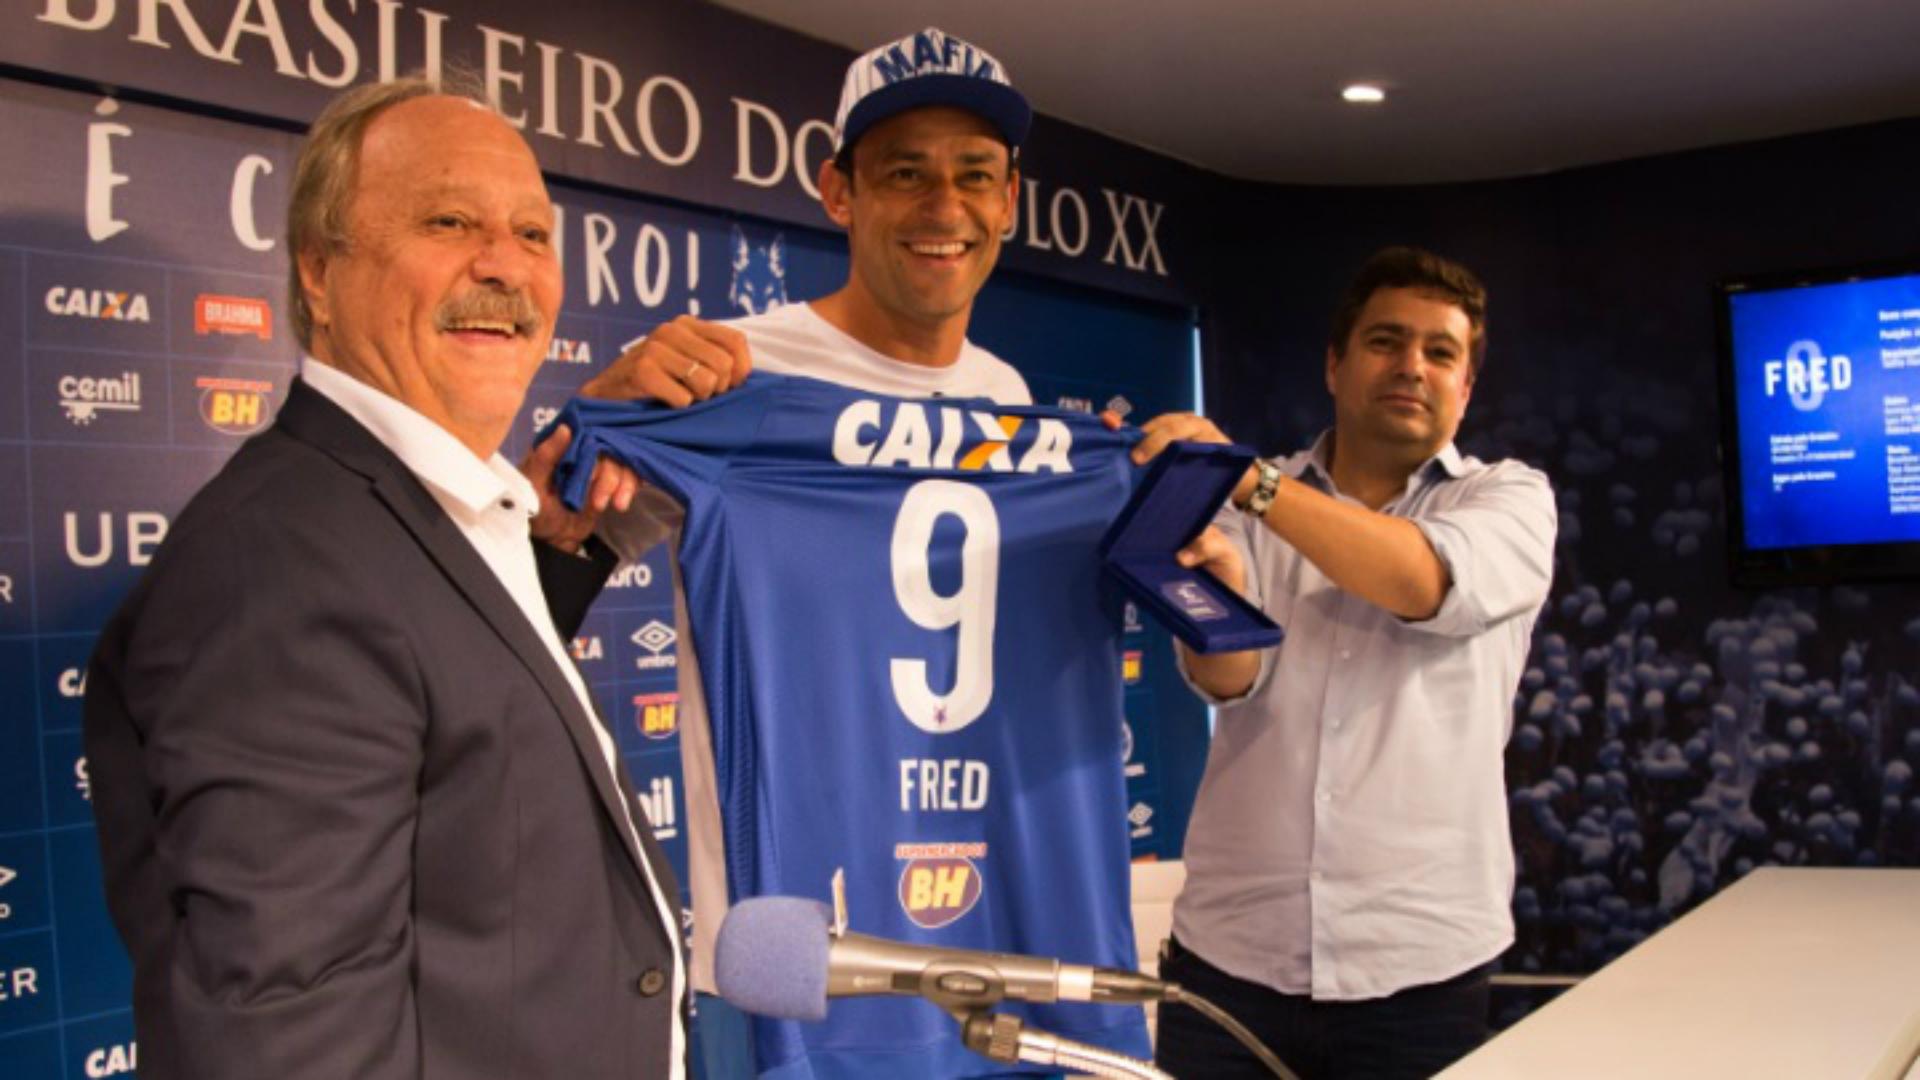 Fred Wagner Pires de Sá Itair Machado Cruzeiro